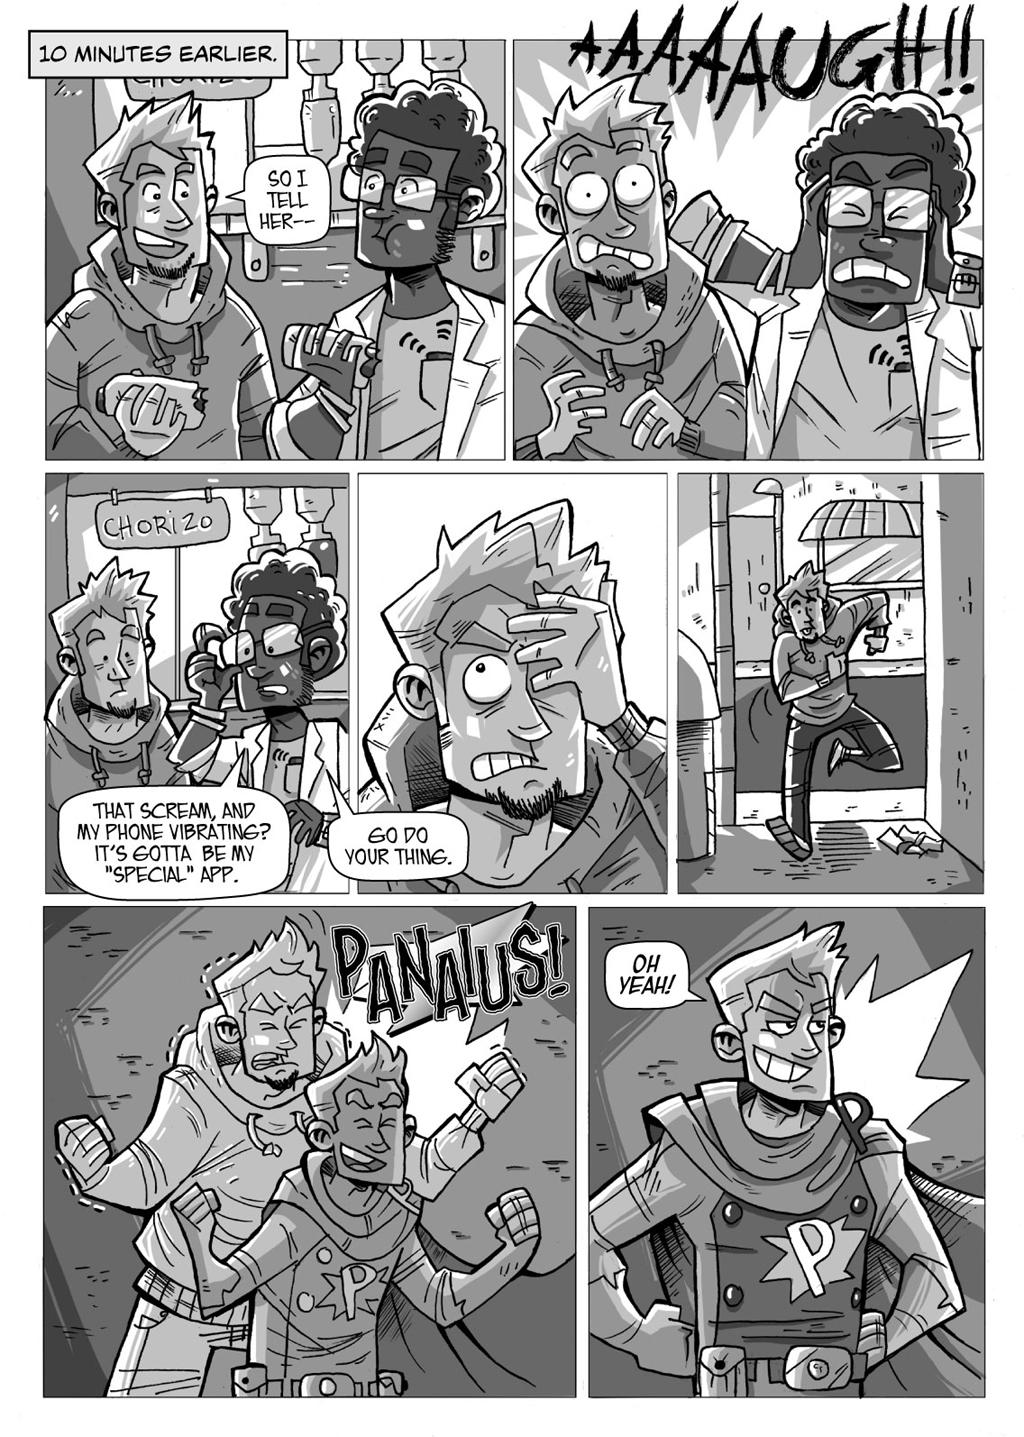 Portent - Page 3